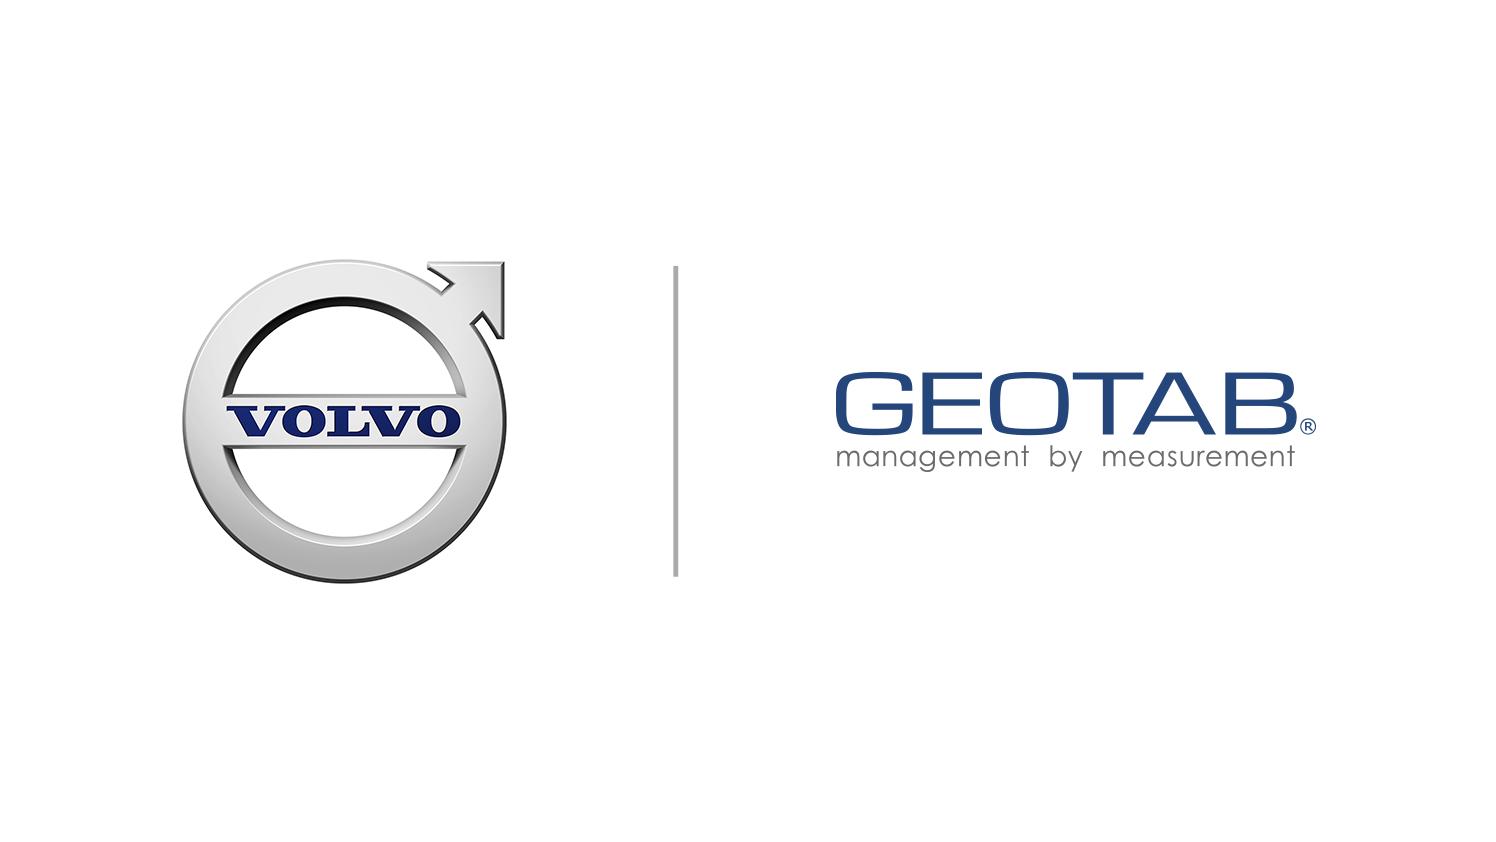 Volvo ironmark logo and Geotab logo